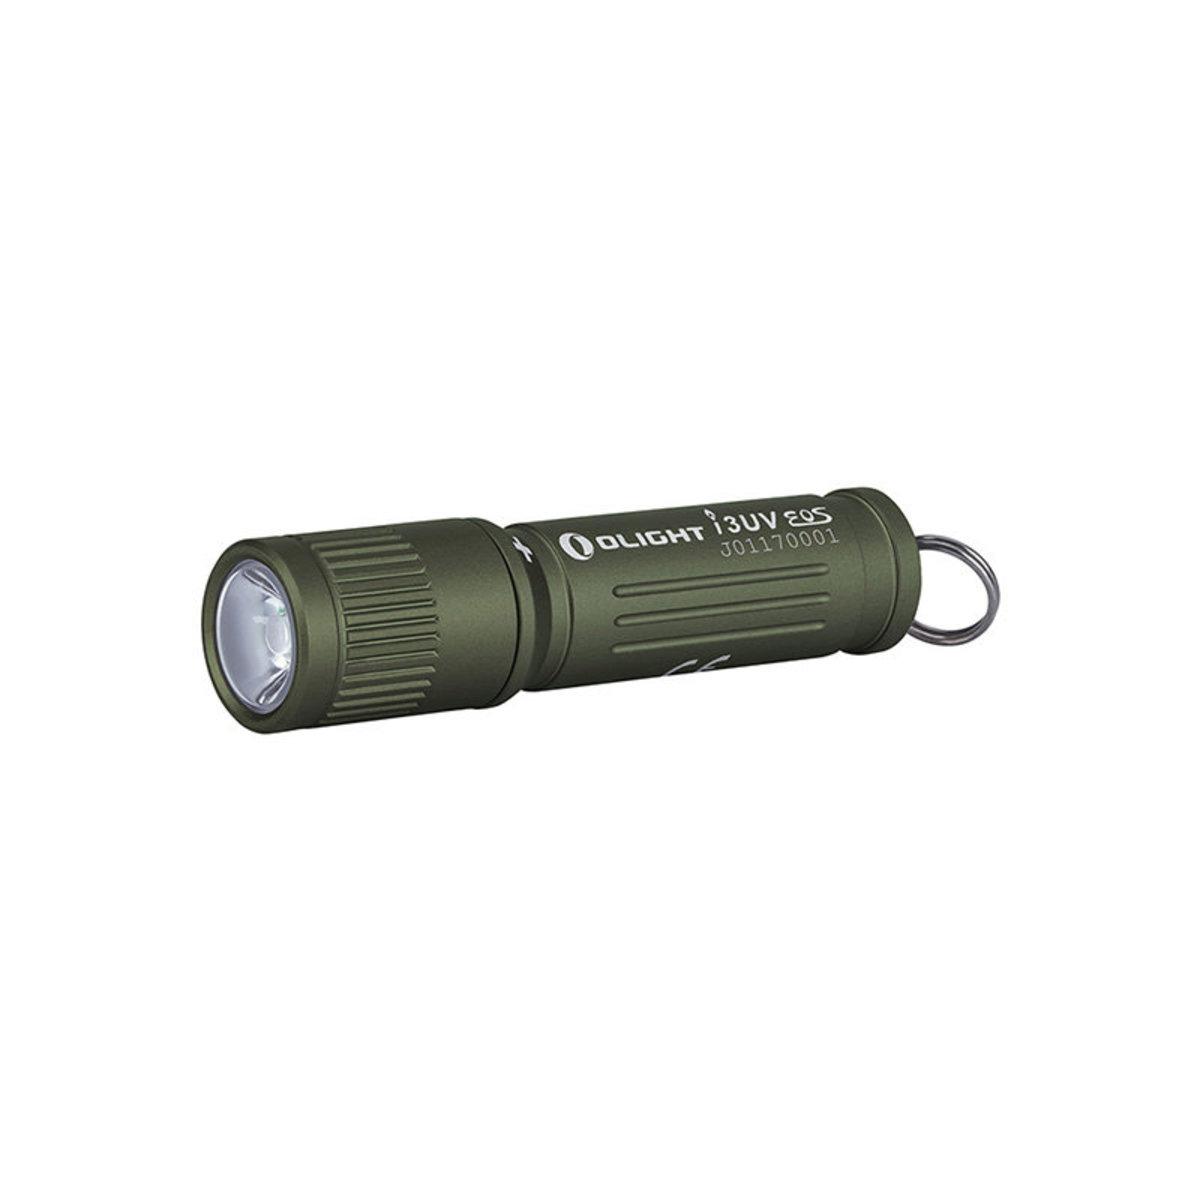 I3EUV 緊湊型紫外光電筒 AAA電池 飛機鋁合金材料